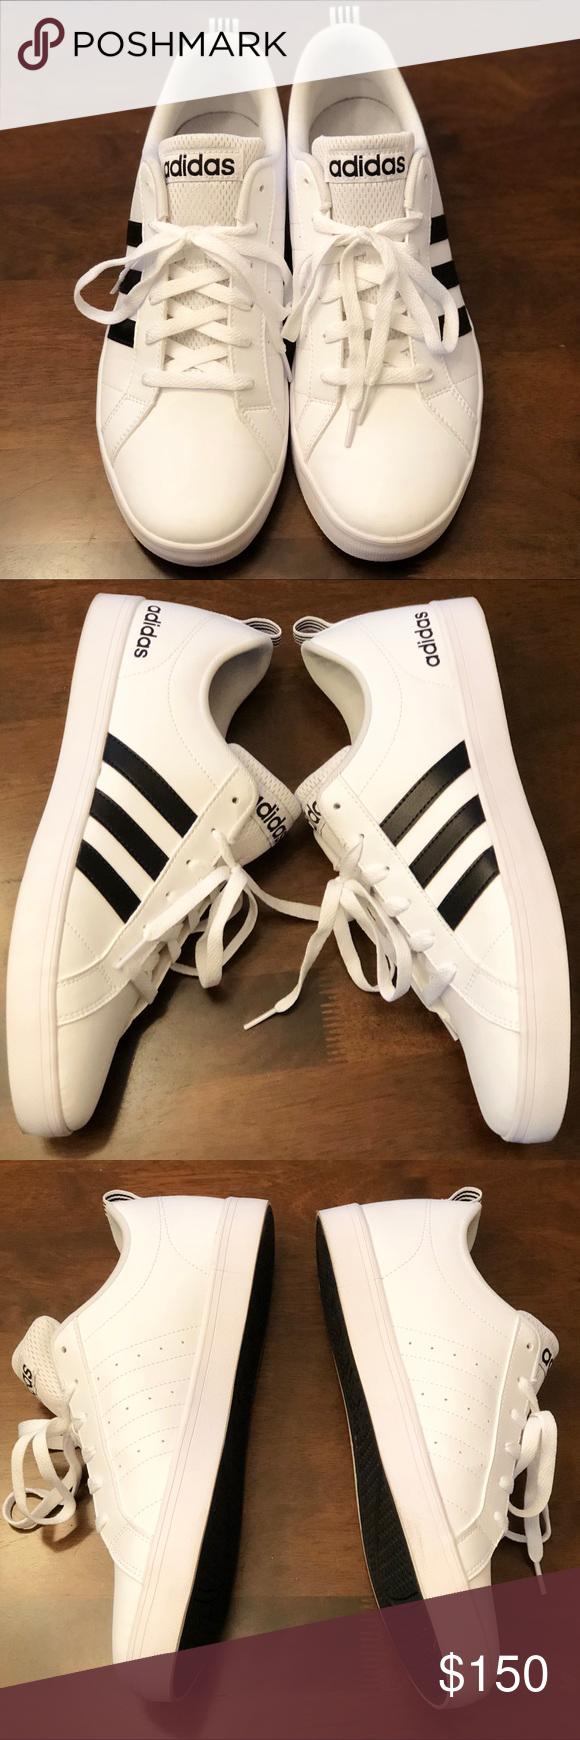 adidas neo scarpe nere e scarpe da ginnastica adidas, le adidas